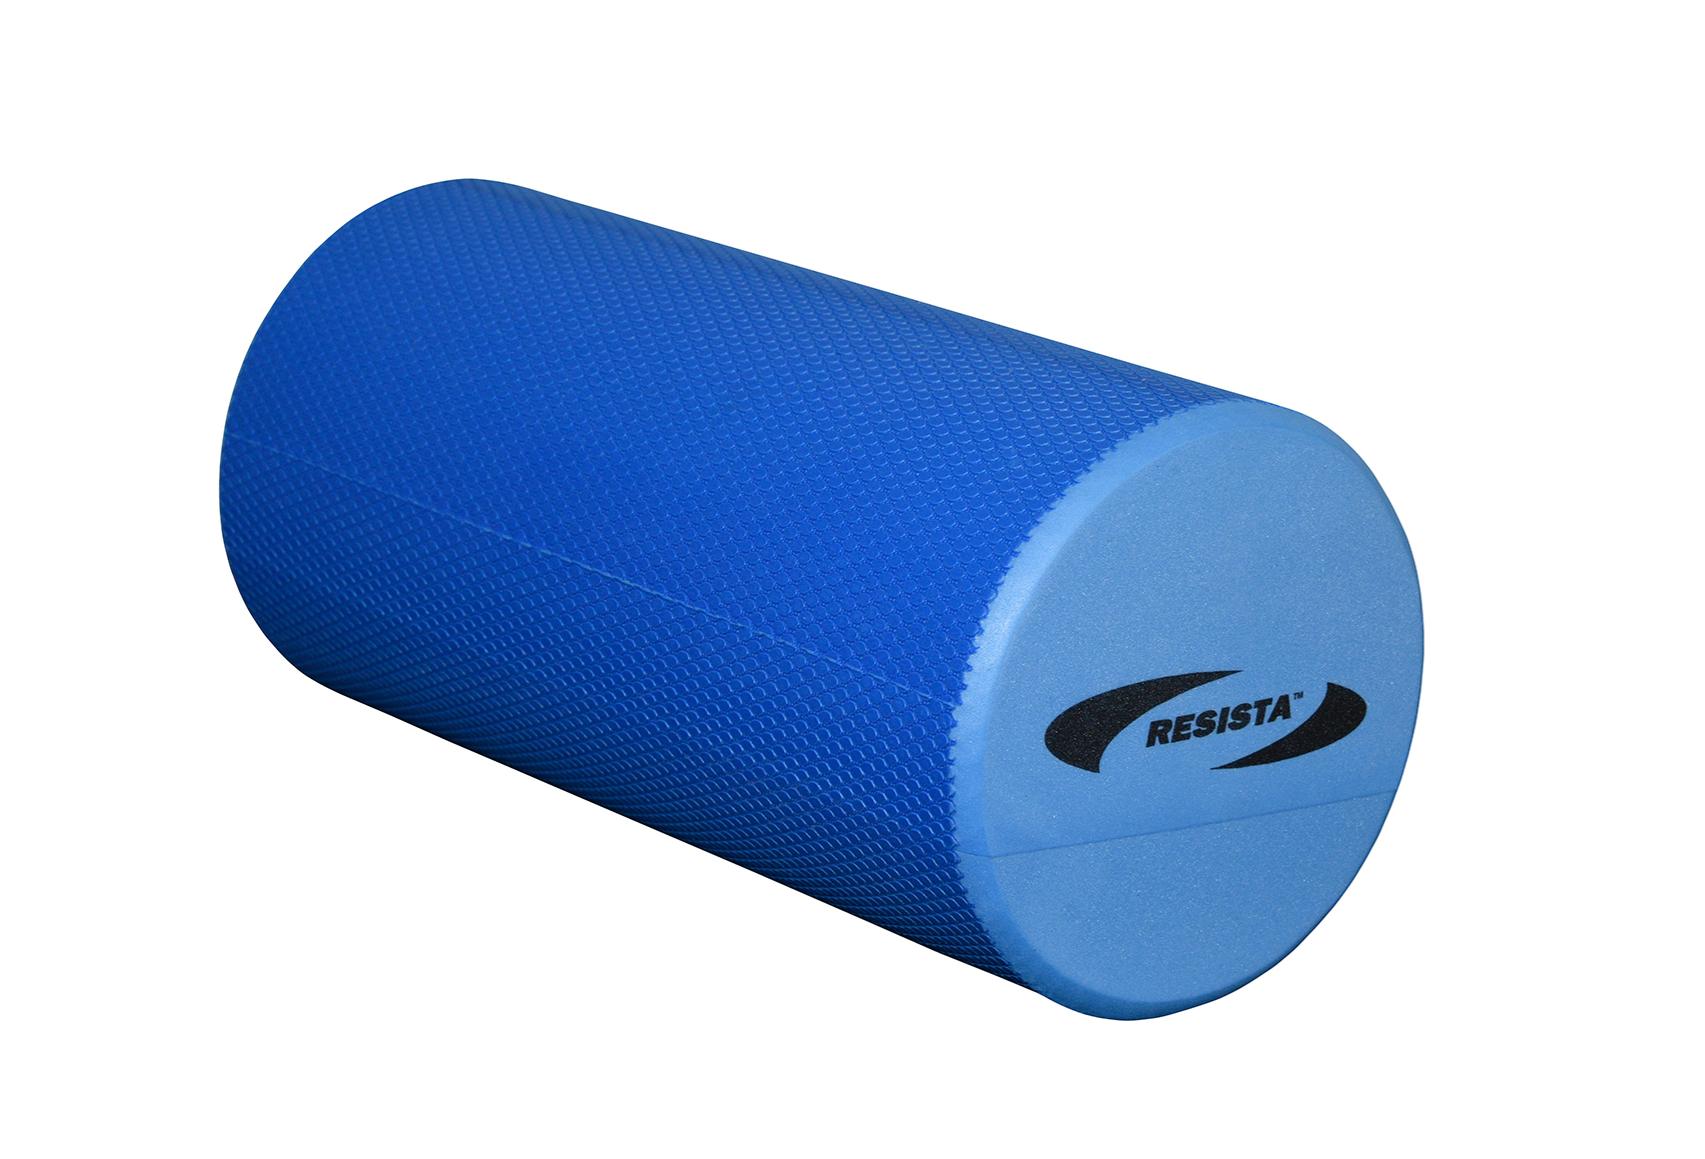 Resista Foam Roller Short | 30cm